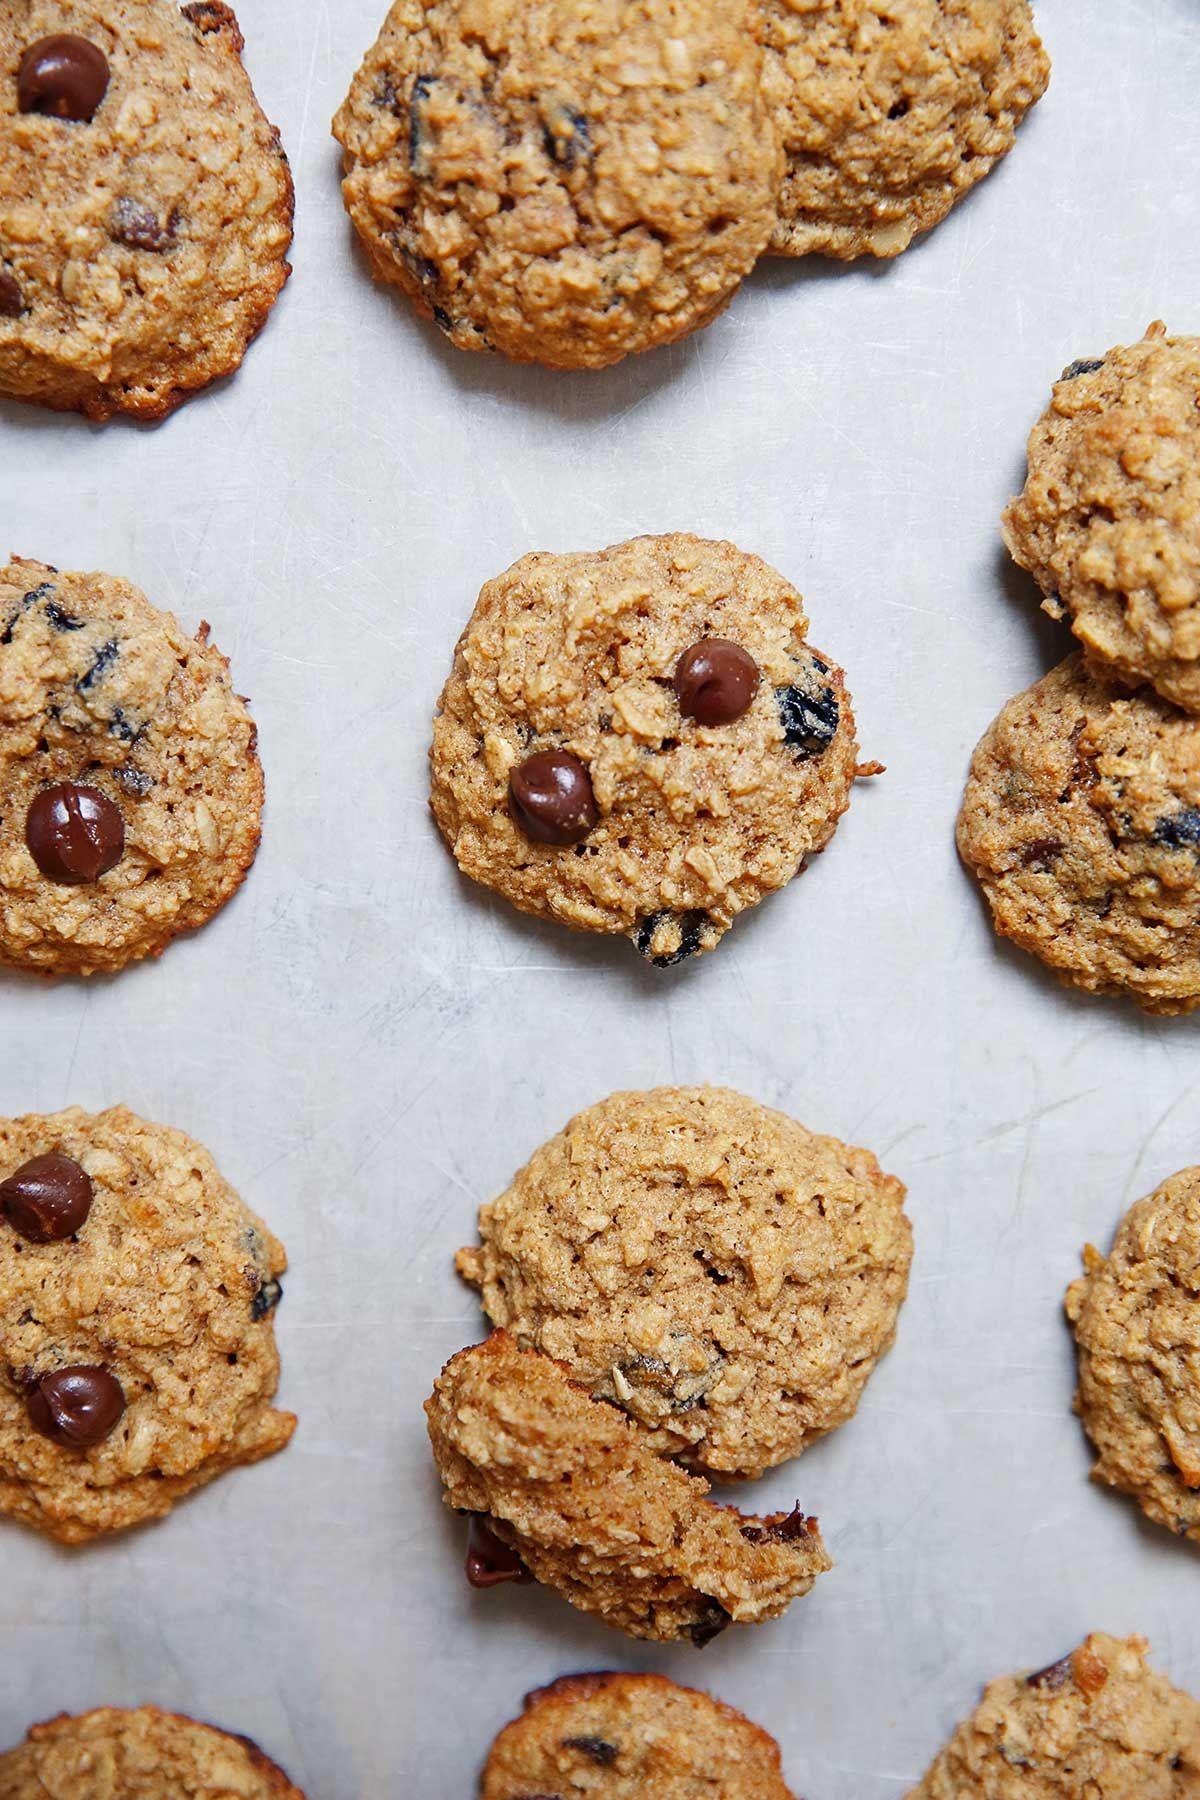 Gluten free oatmeal raisin cookies lexis clean kitchen